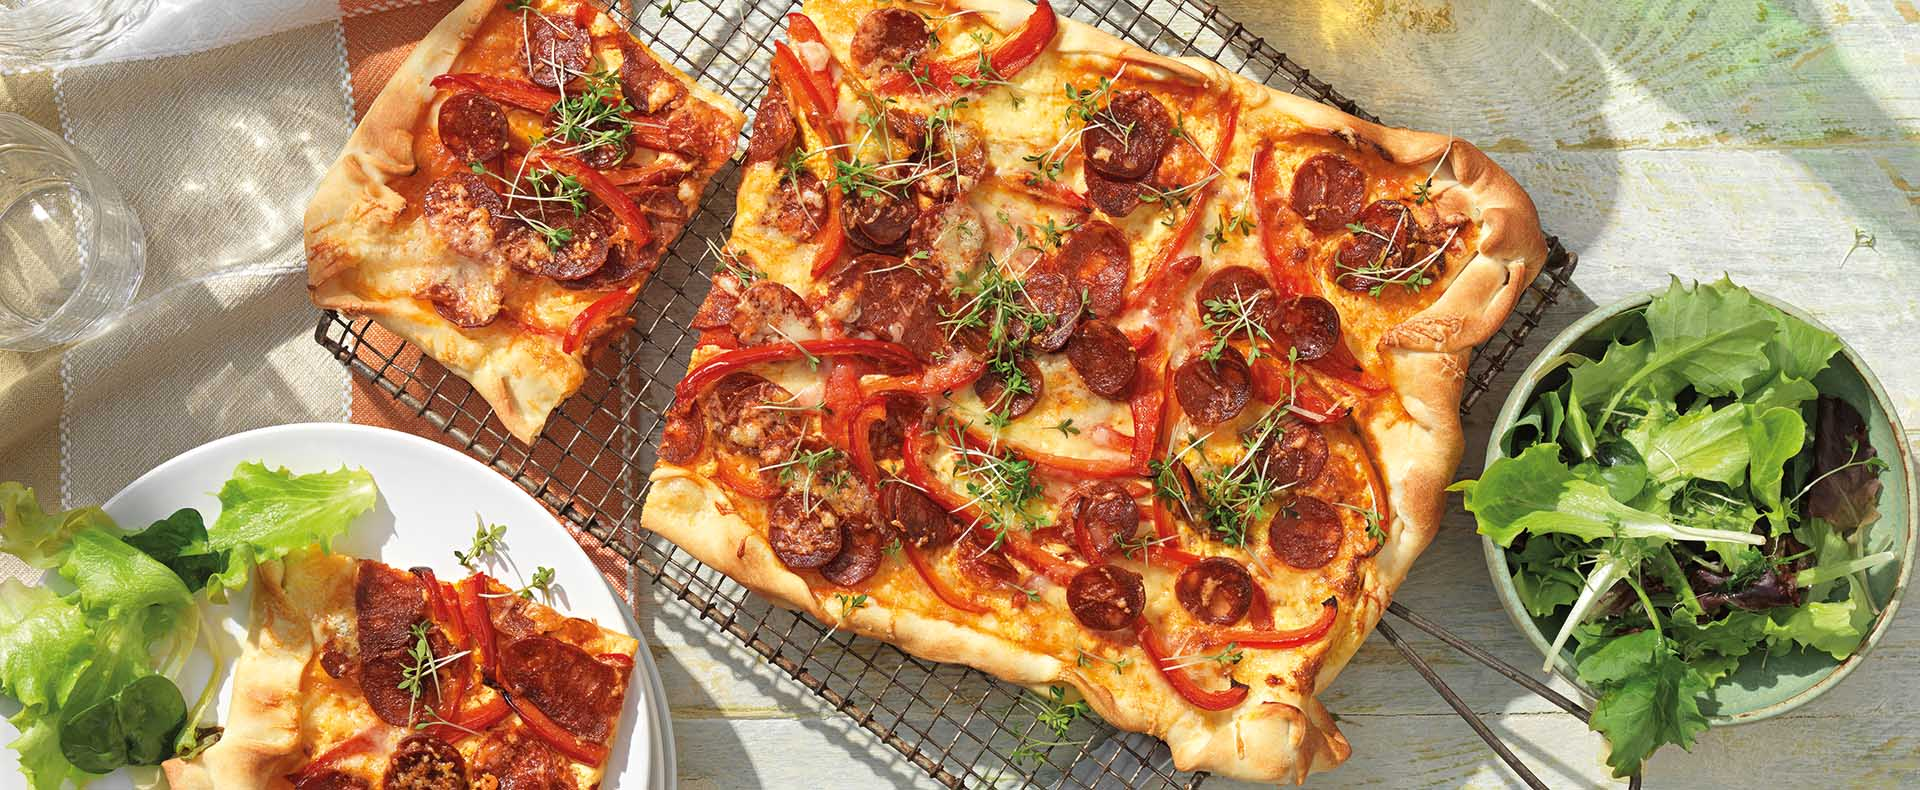 Flammkuchen met chorizo en paprika